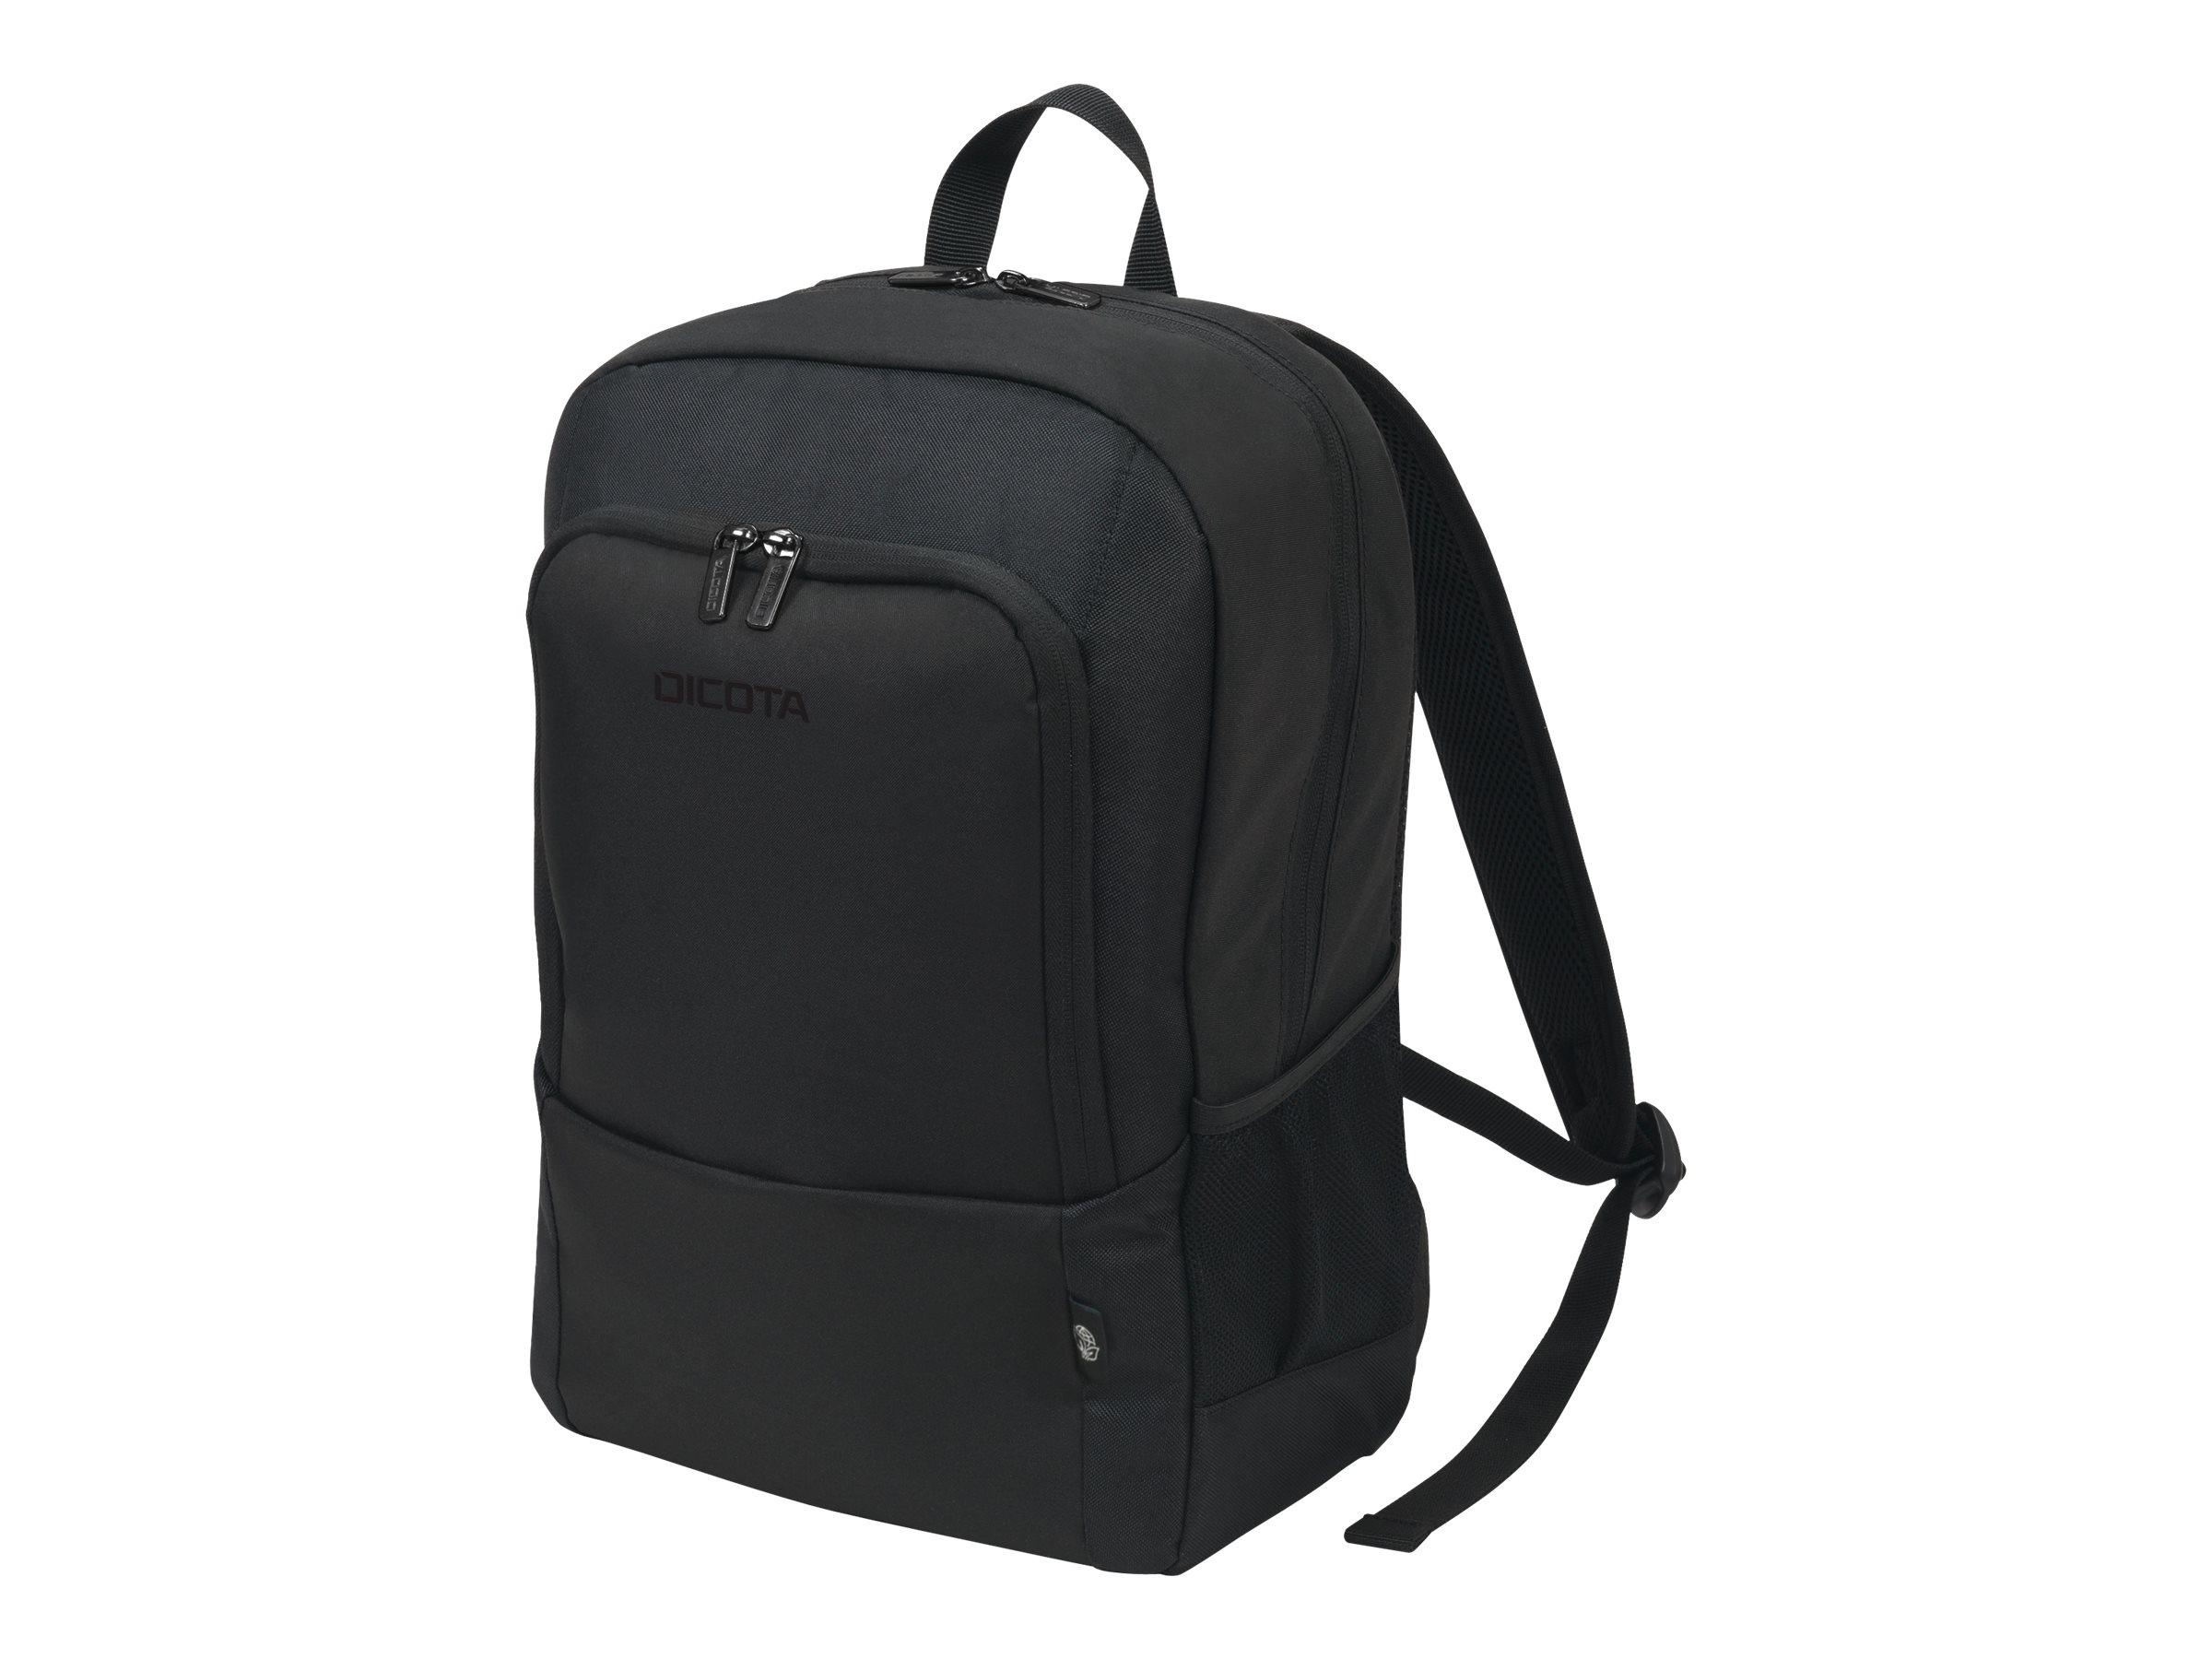 DICOTA Eco BASE - Notebook-Rucksack - 35.8 cm - 13